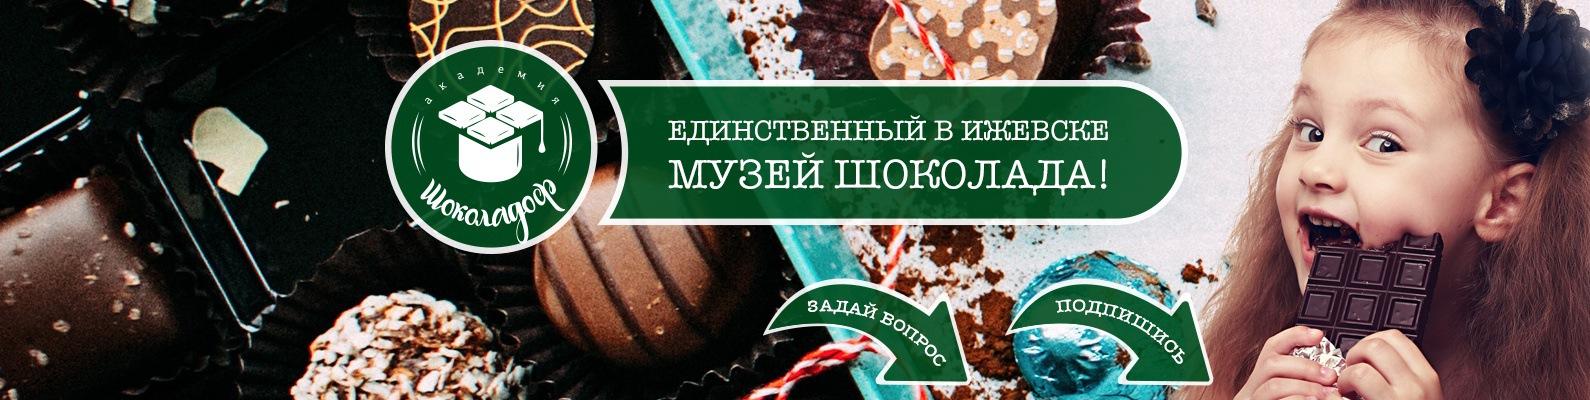 Музей шоколада в Ижевске | Шоколадоф